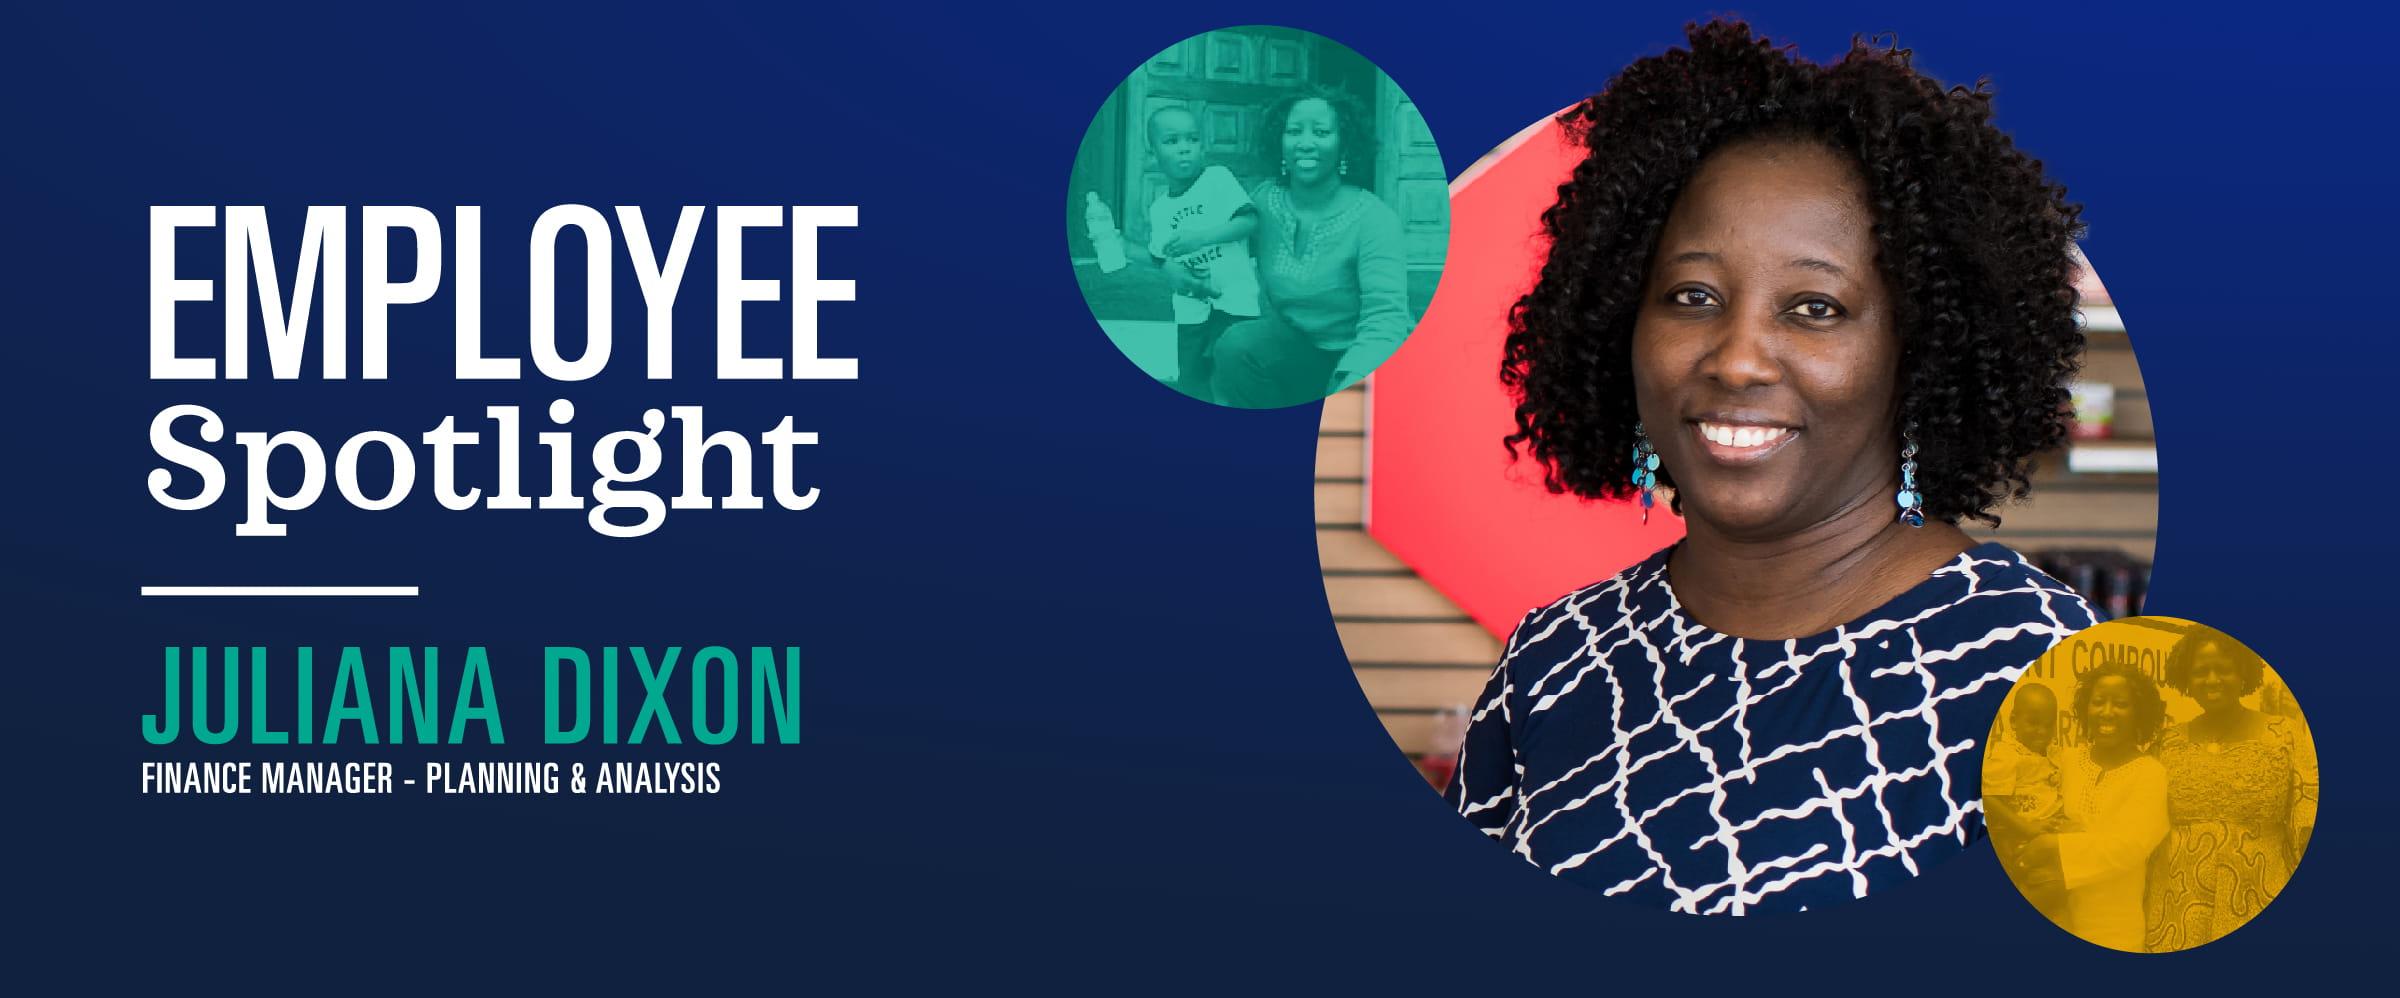 Juliana Koffa Dixon; Liberia; Charitable Giving; Employee Volunteer